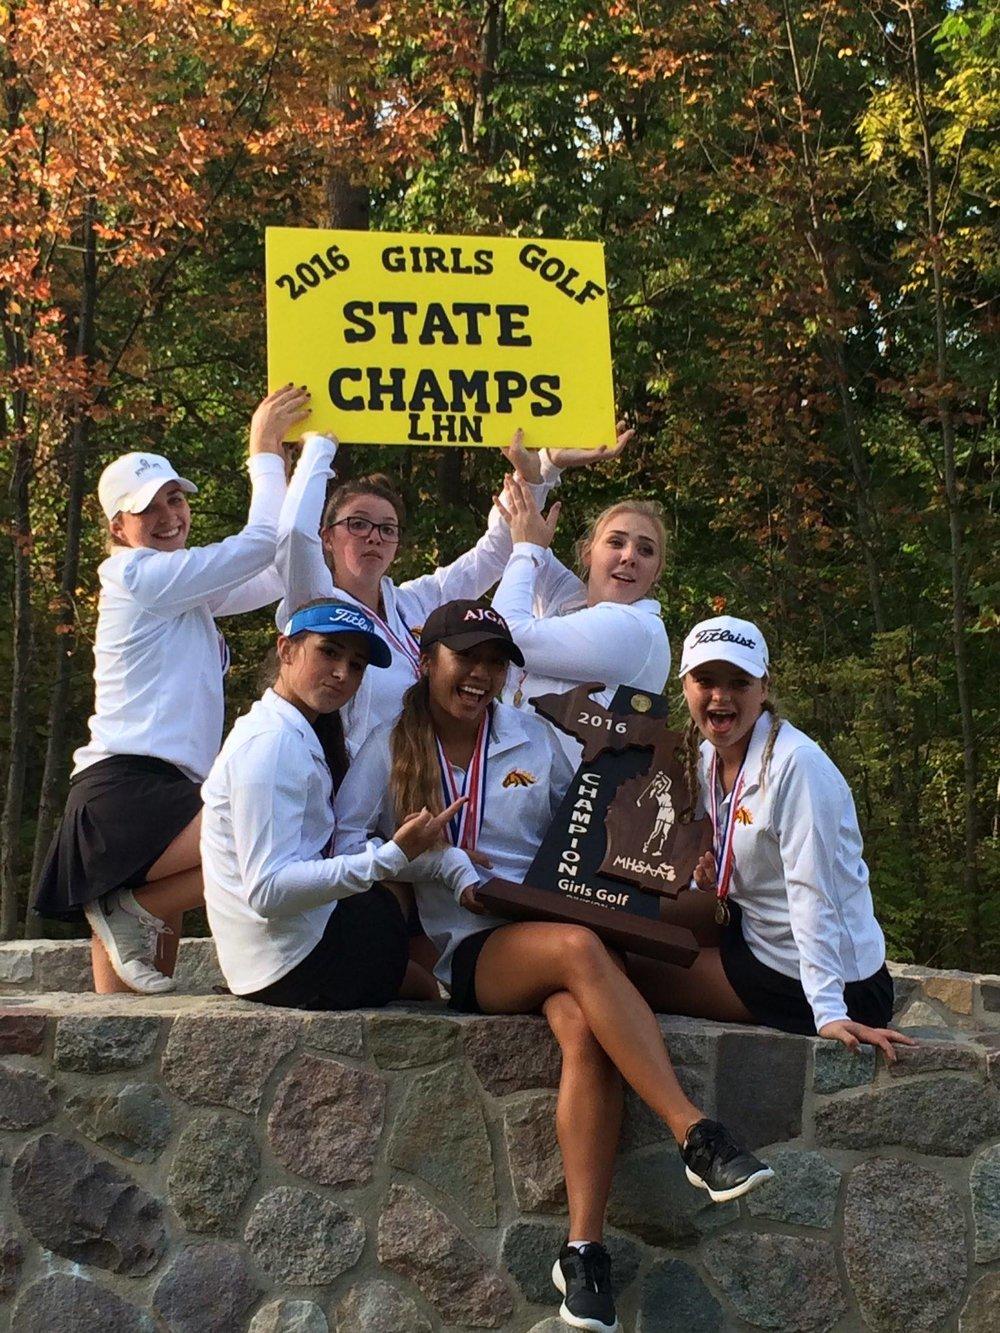 Lutheran_North_Macomb_Michigan_Golf_Girls_Champions_Coach_Laurie_Gill (3).jpg